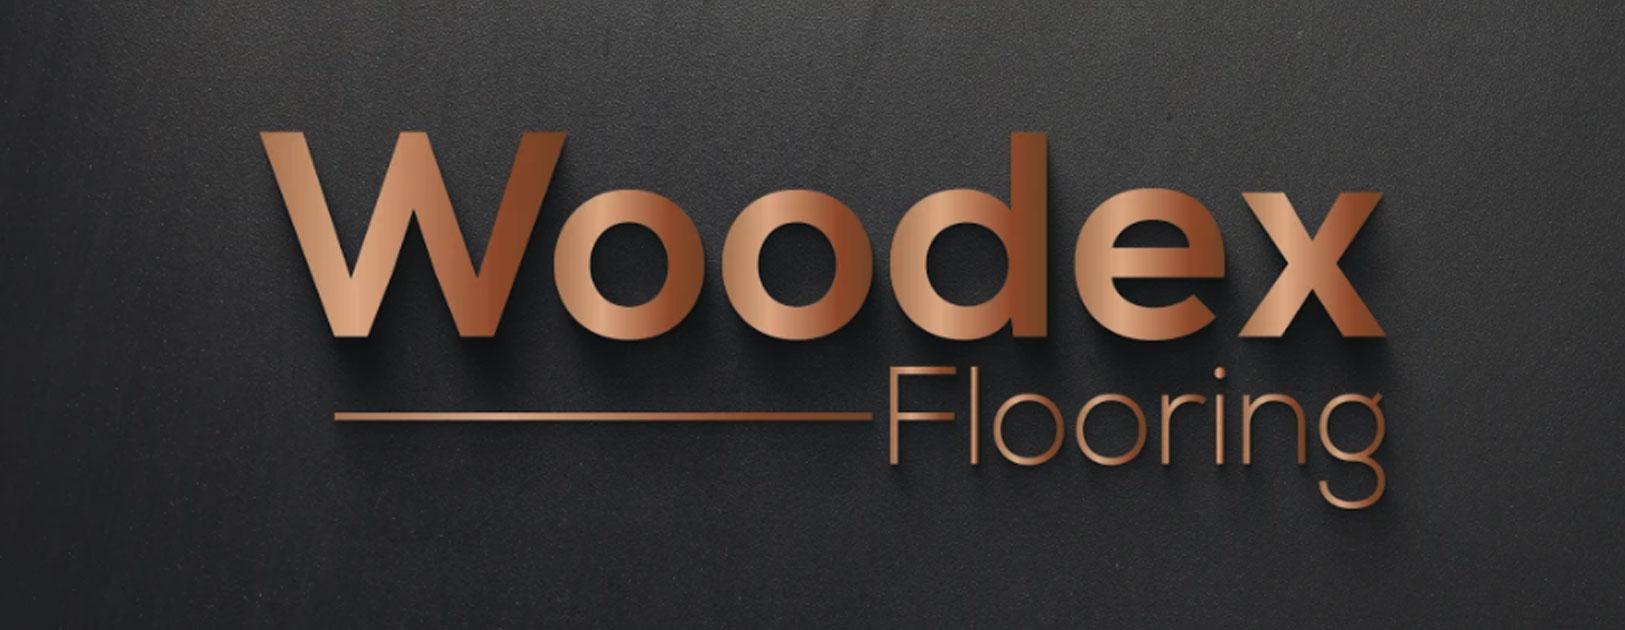 Woodex-flooring-logo